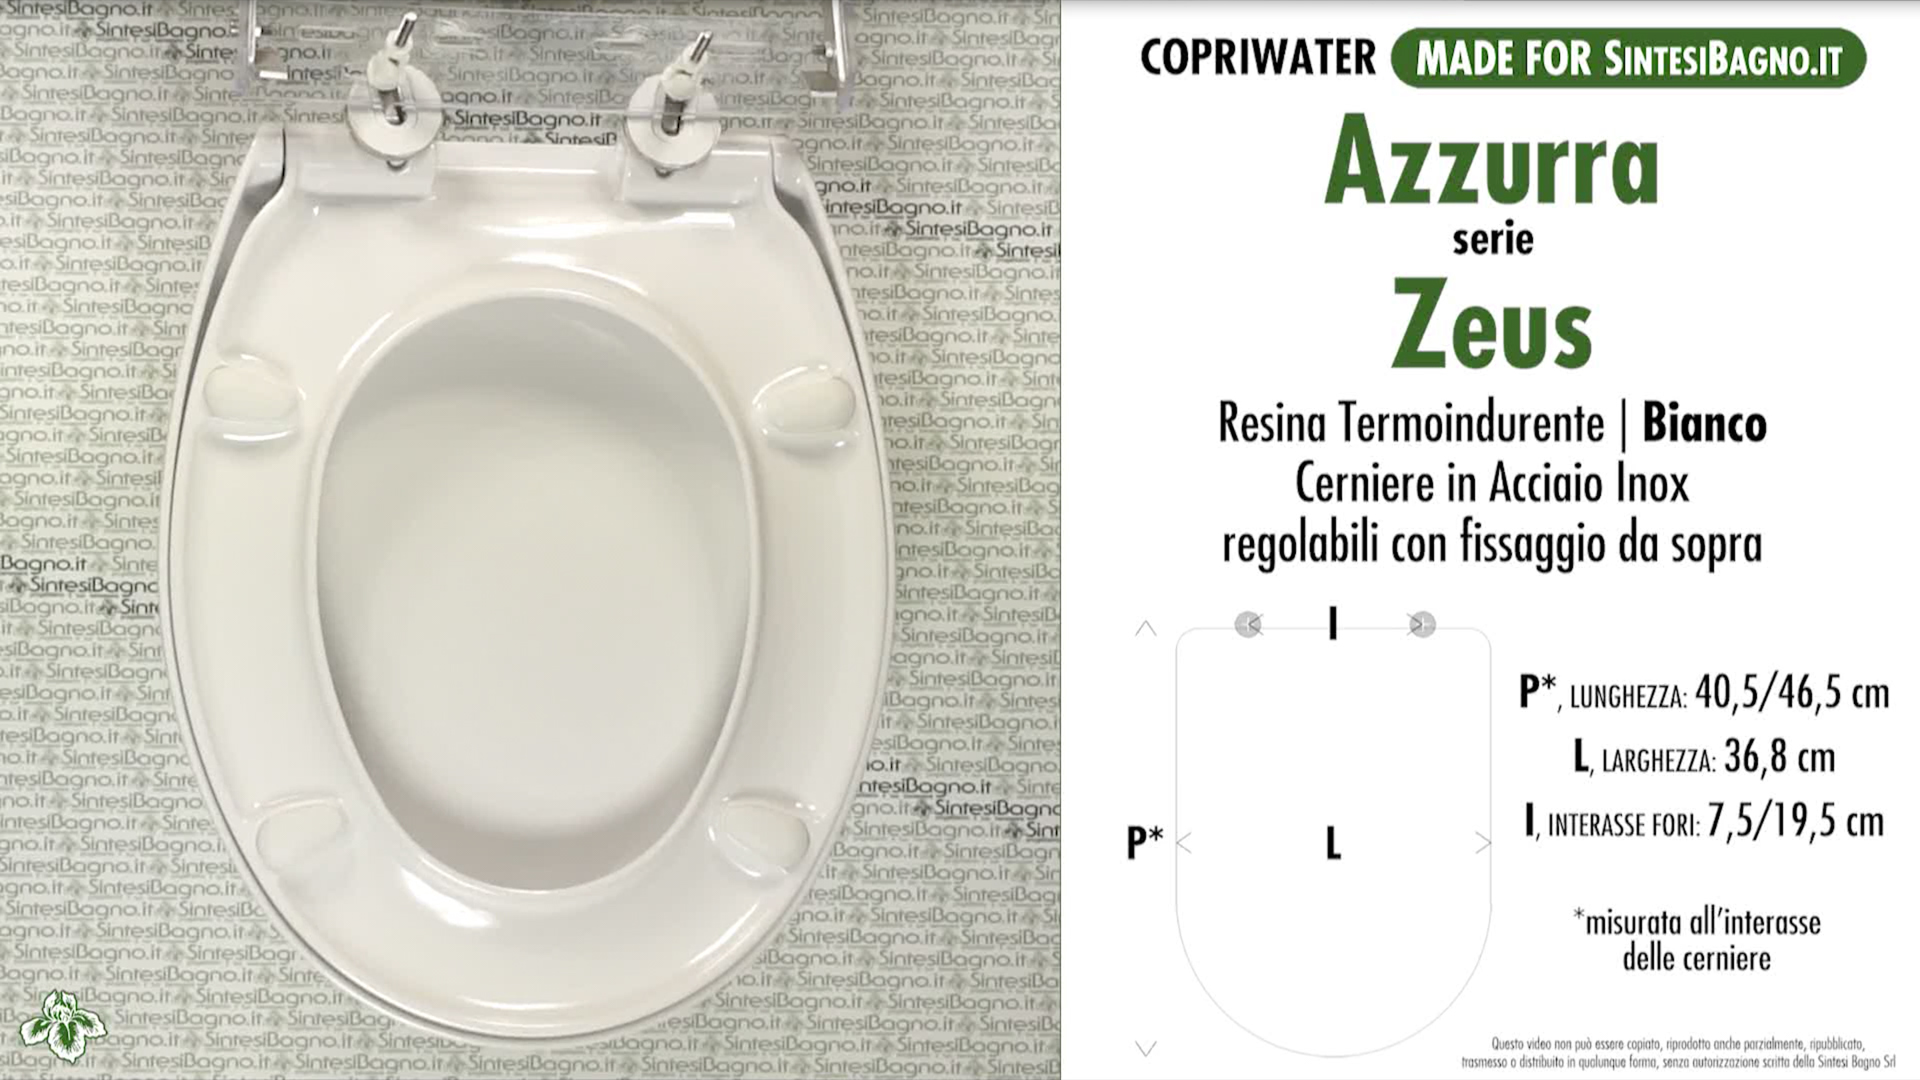 SCHEDA TECNICA MISURE copriwater AZZURRA ZEUS